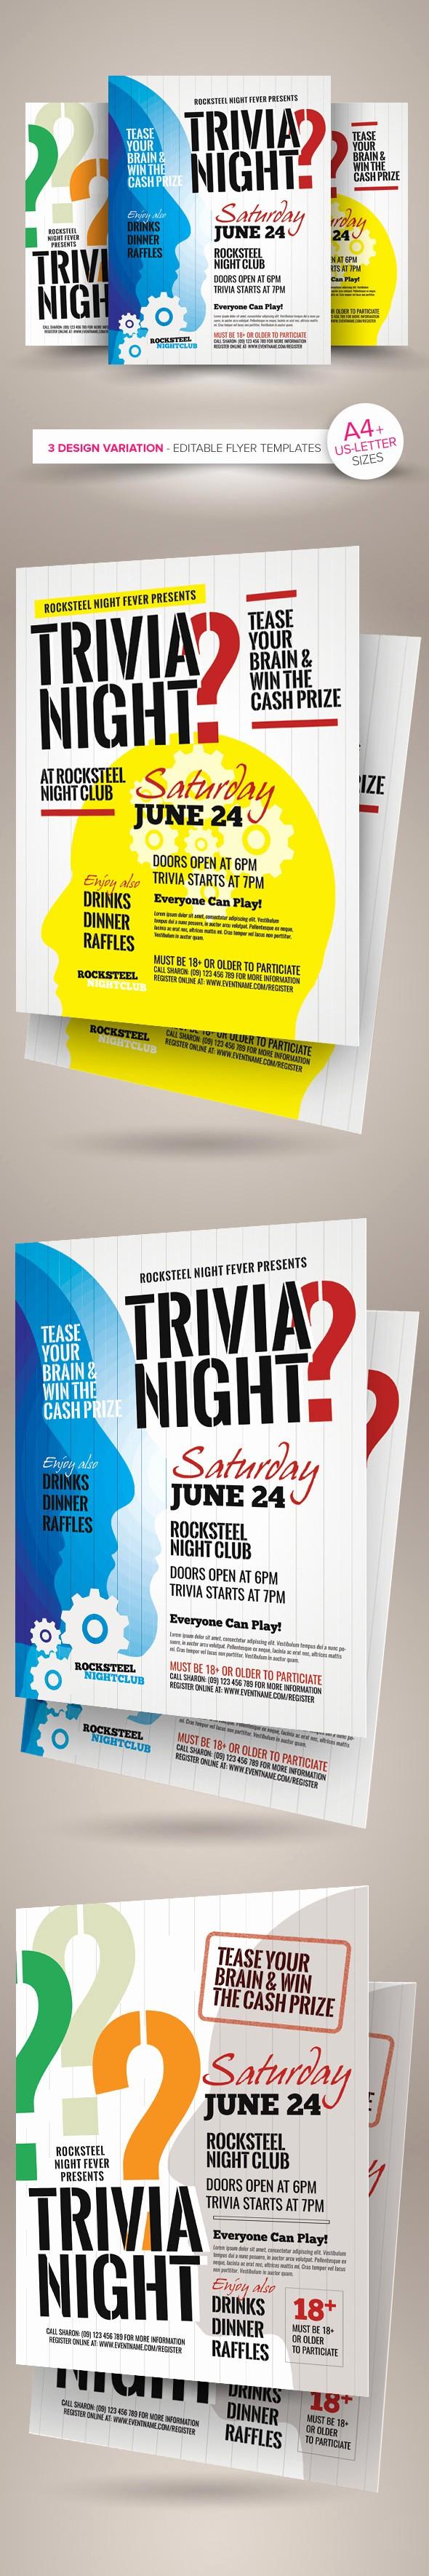 Trivia Night Flyer Template Free Fresh Trivia Night Flyer Templates On Behance